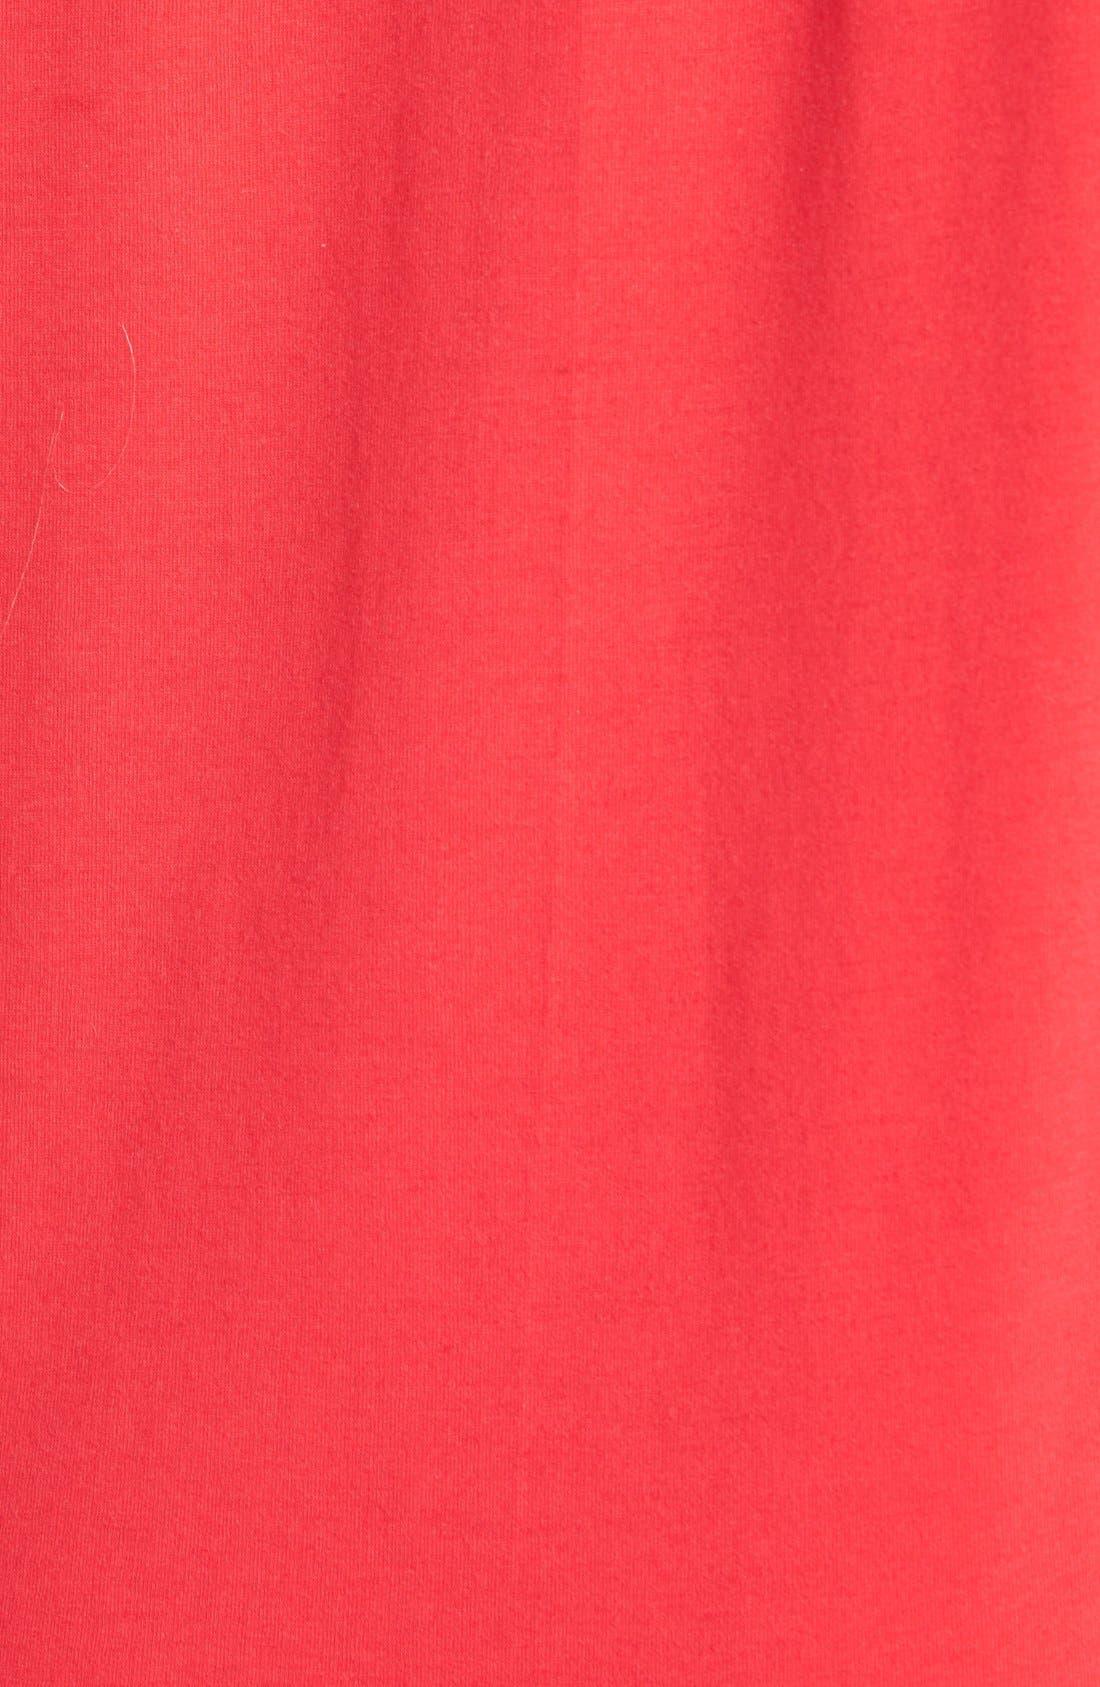 Alternate Image 3  - Nordstrom 'Effortless' Pajamas